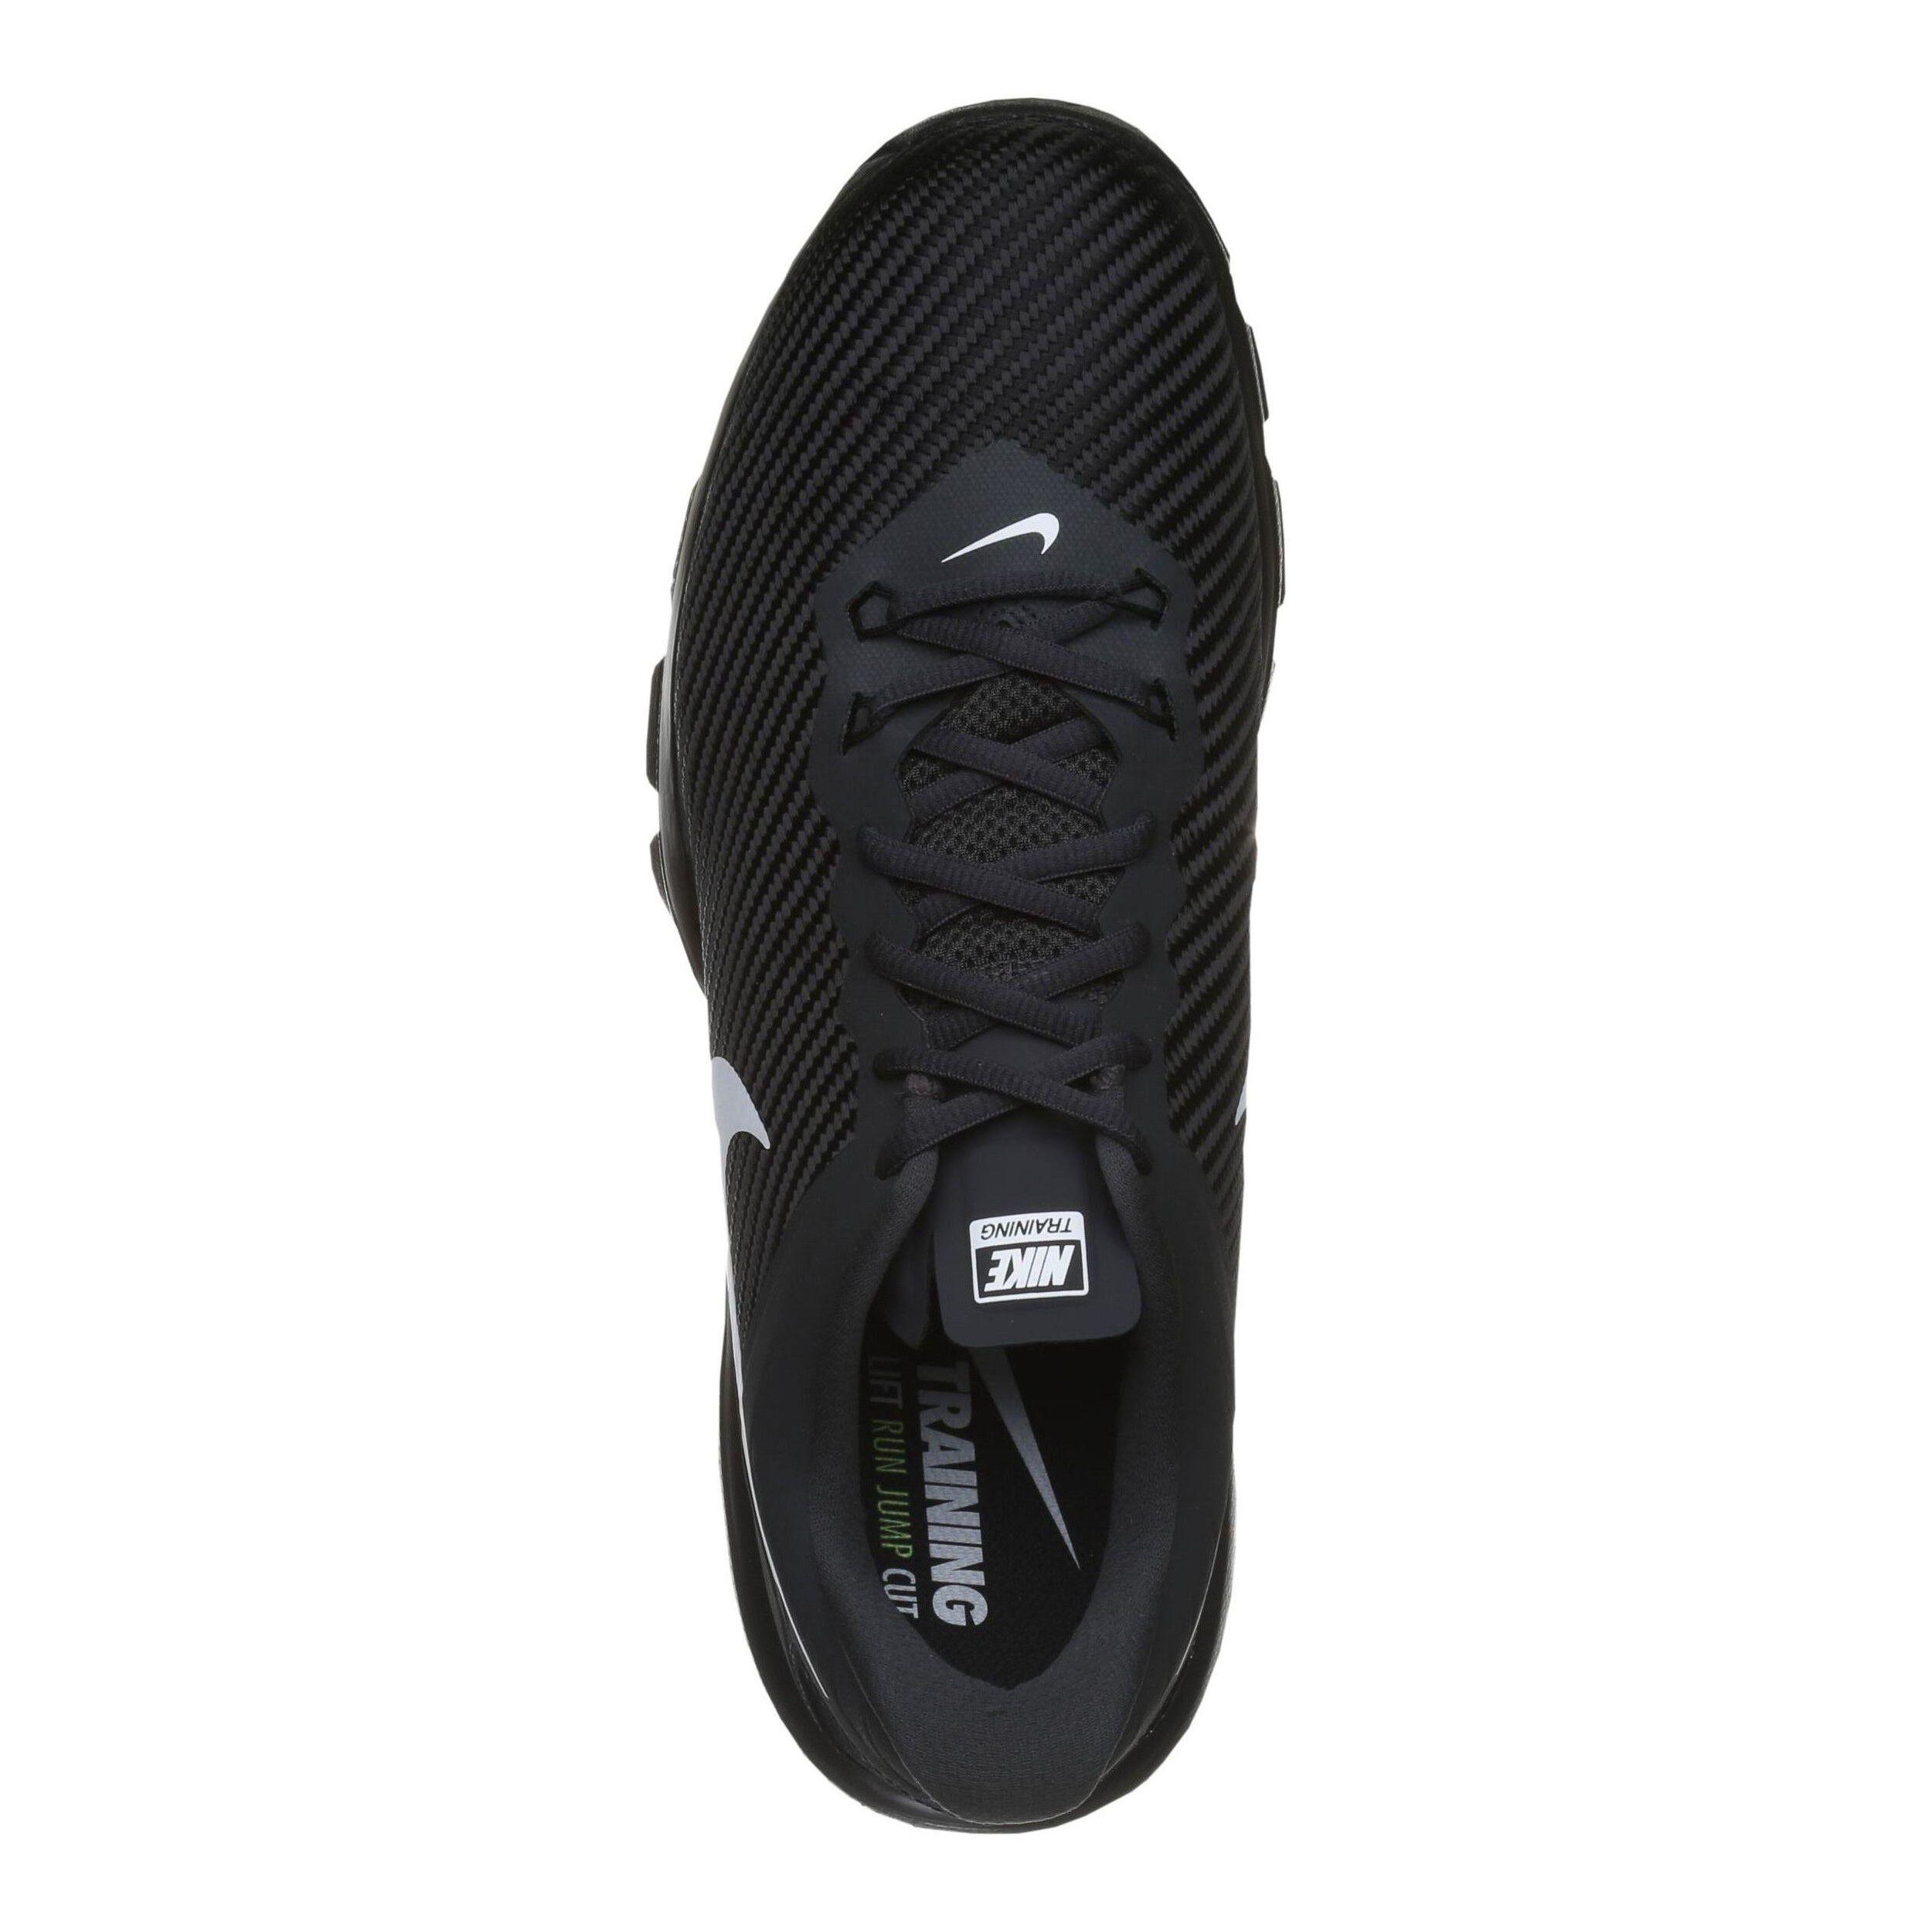 Nike Air Max Full Ride TR 1.5 Fitnessschuh Herren Schwarz